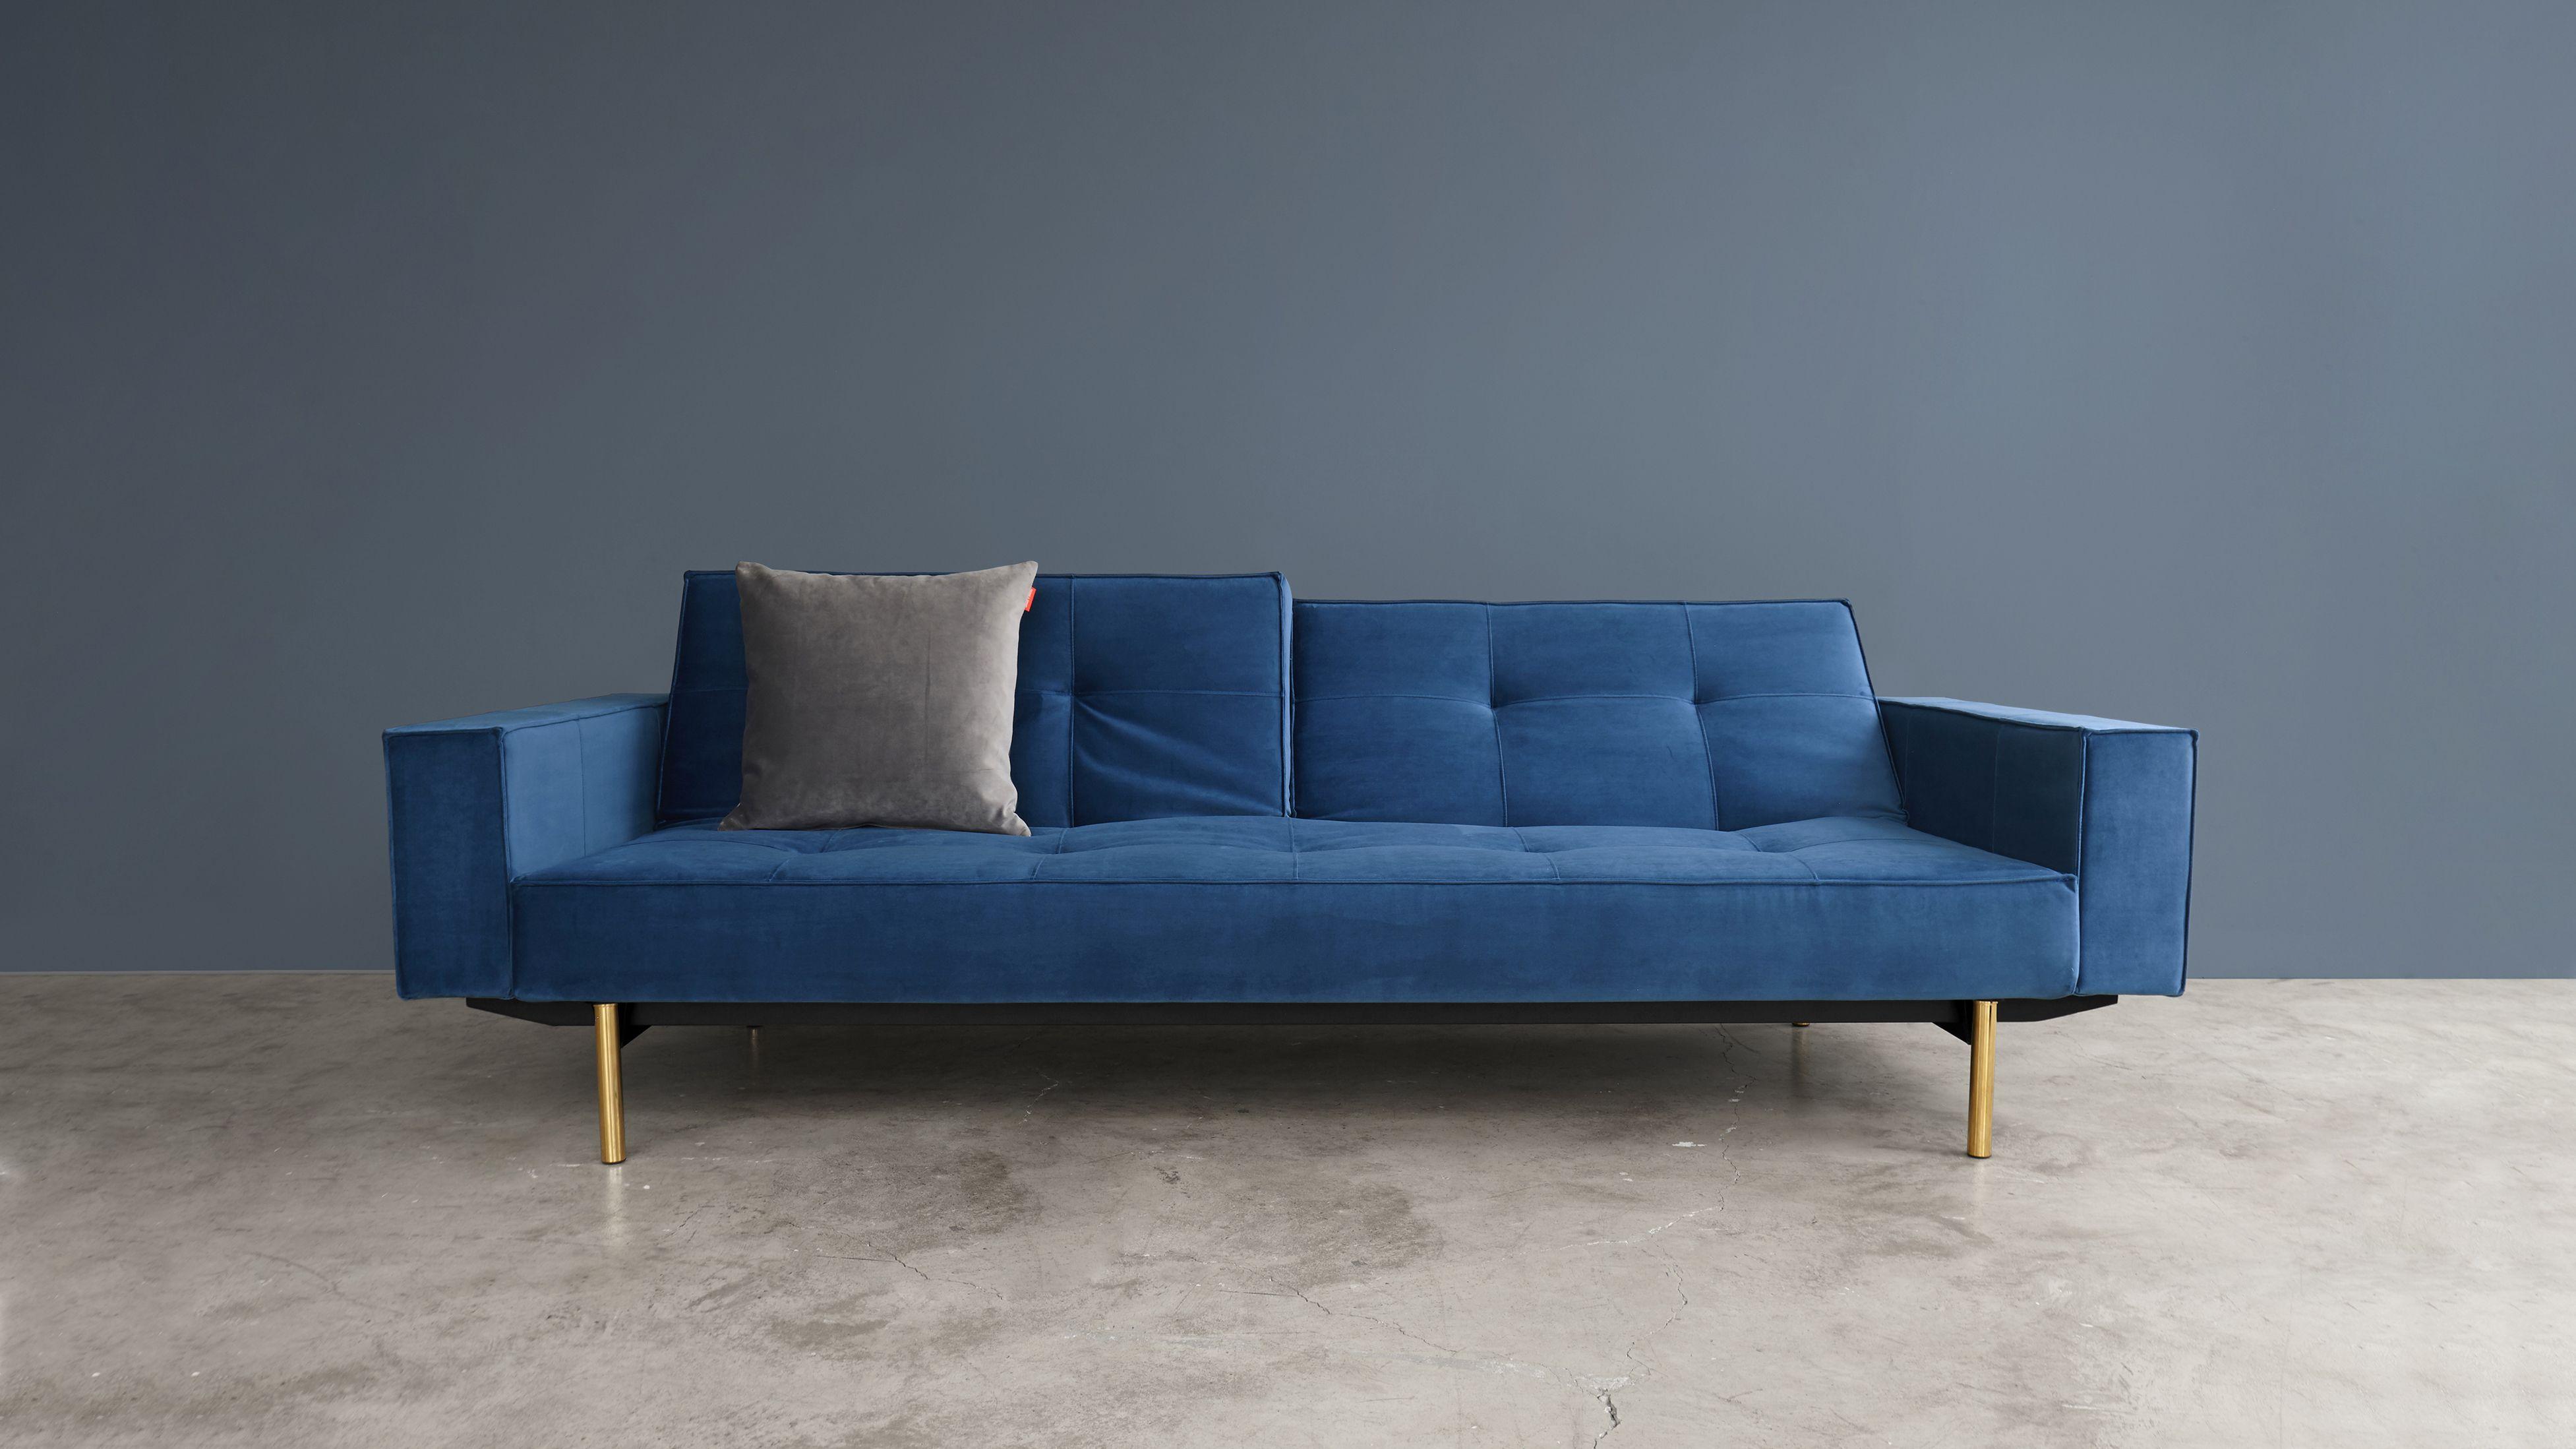 sofy innovation istyle splitback baton sofa rozk adana. Black Bedroom Furniture Sets. Home Design Ideas